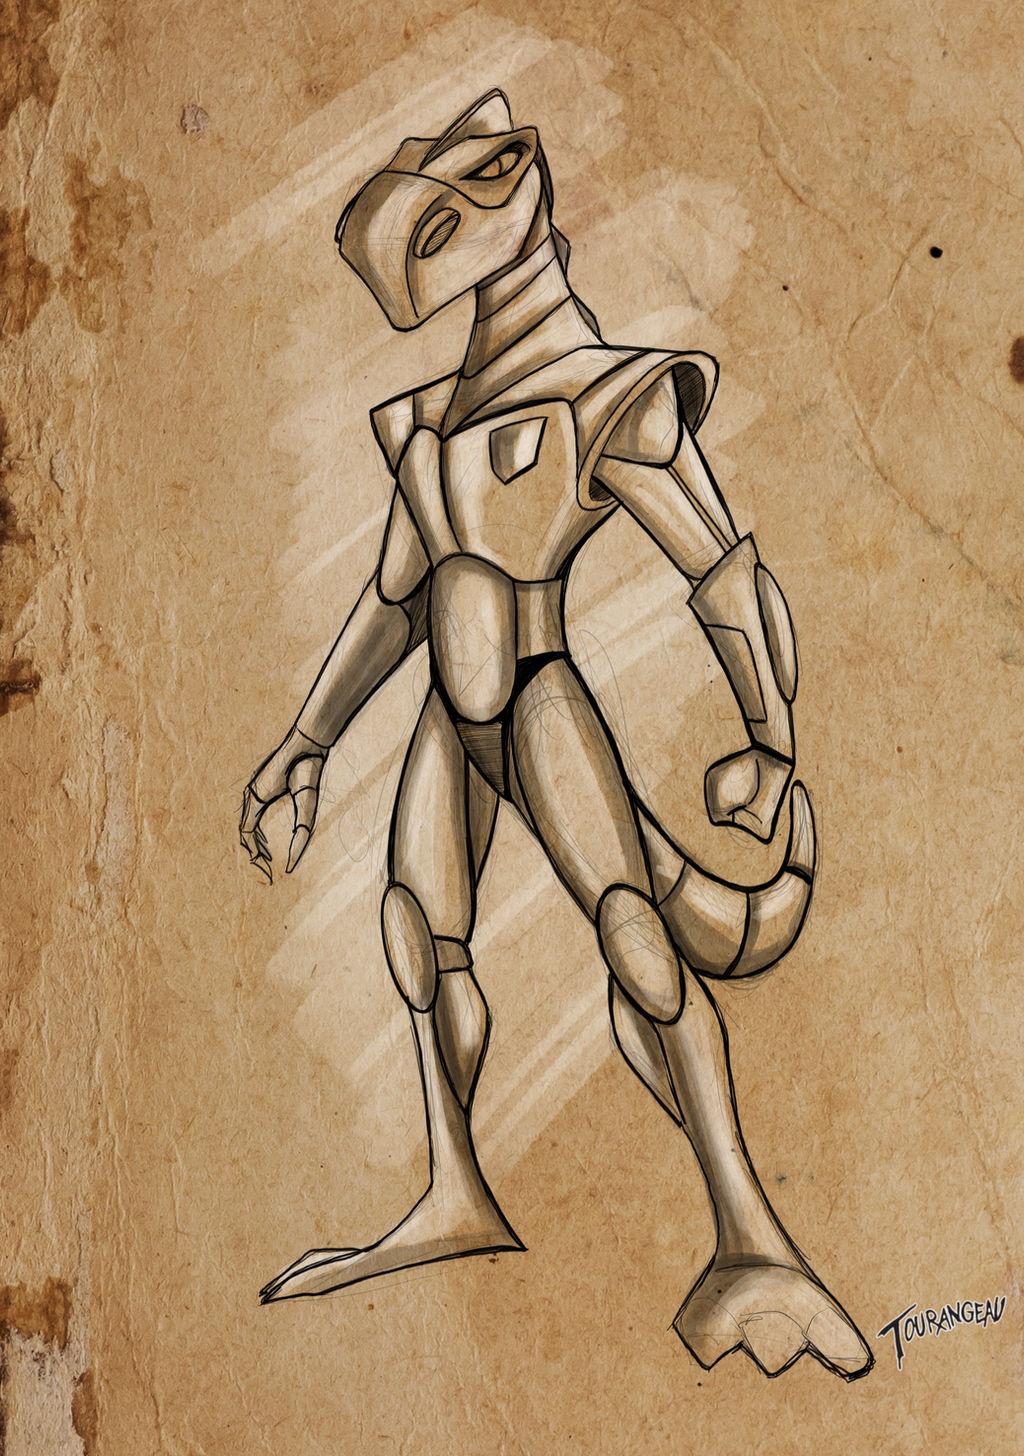 Dino-astronaut concept